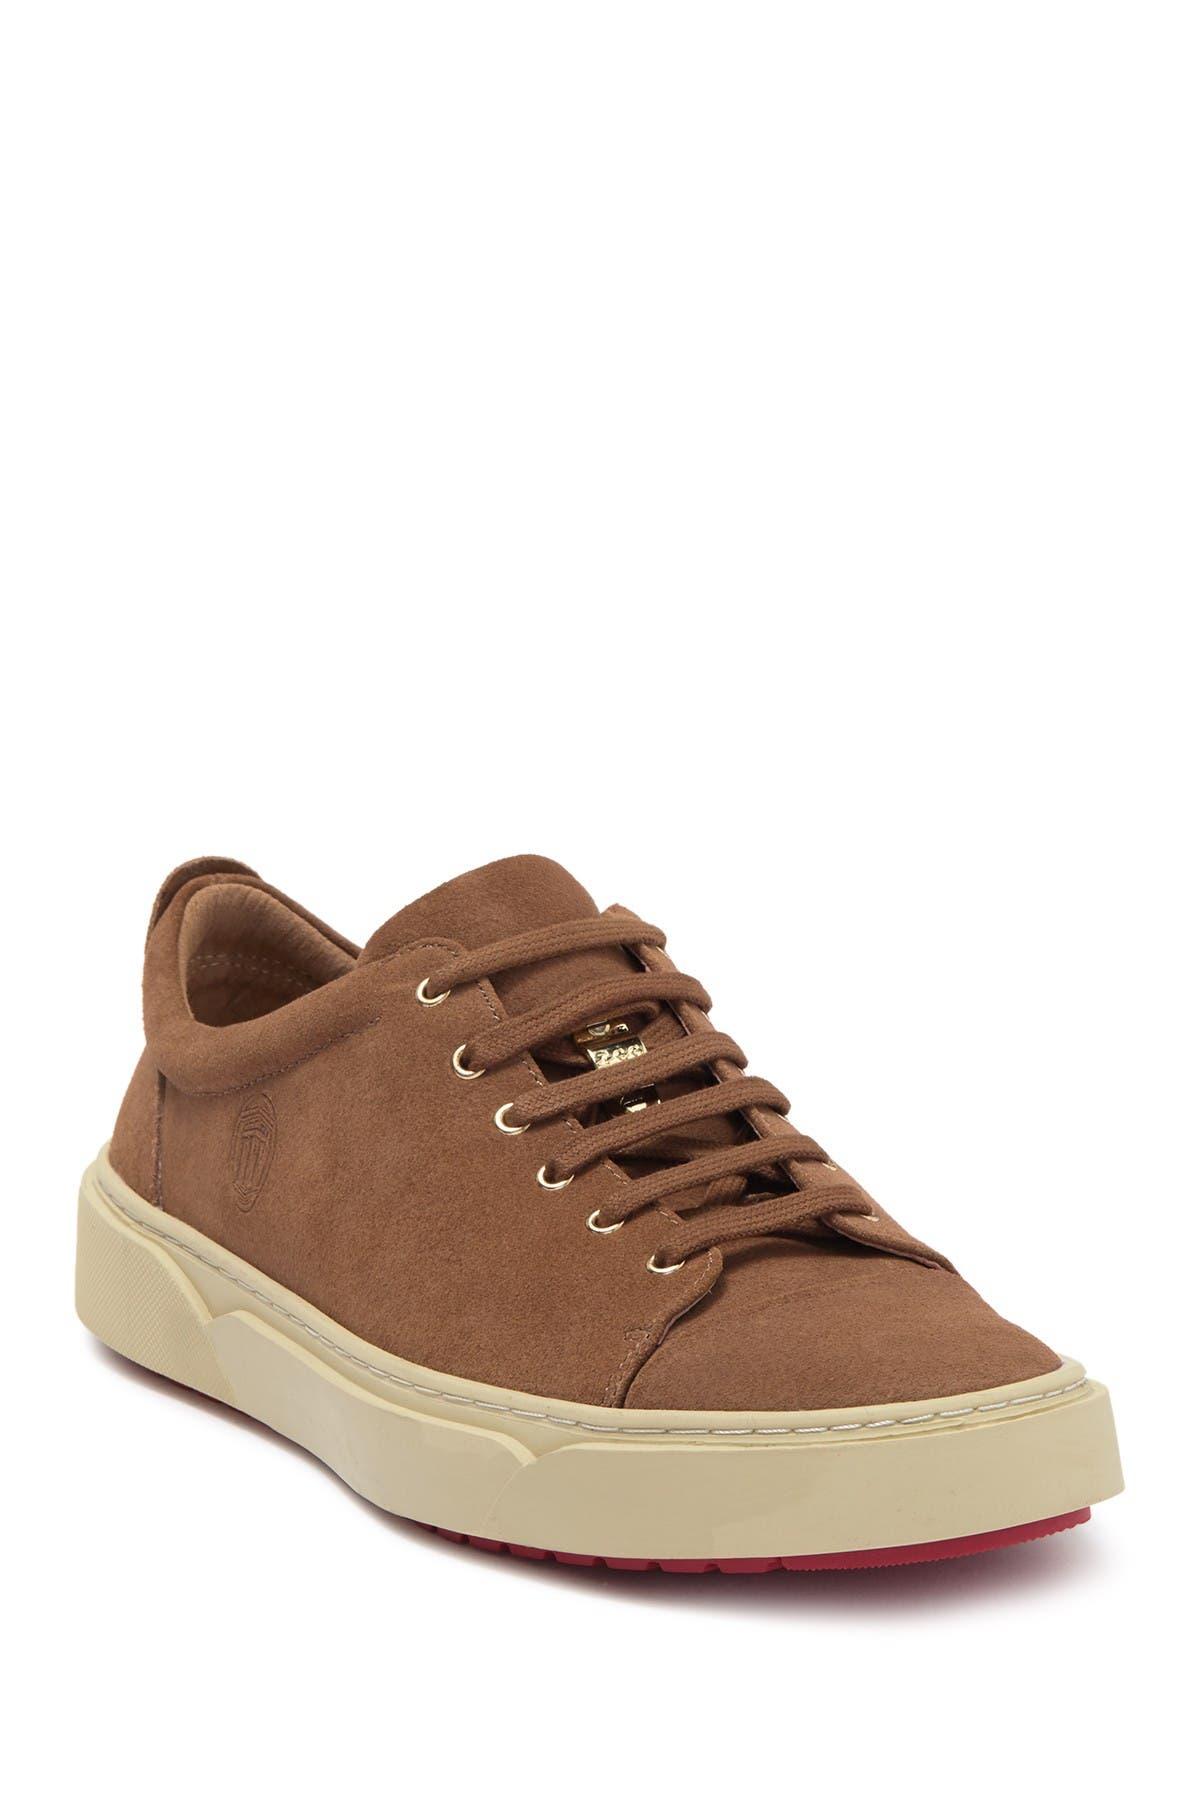 Image of TCG Creuzot Suede Sneaker